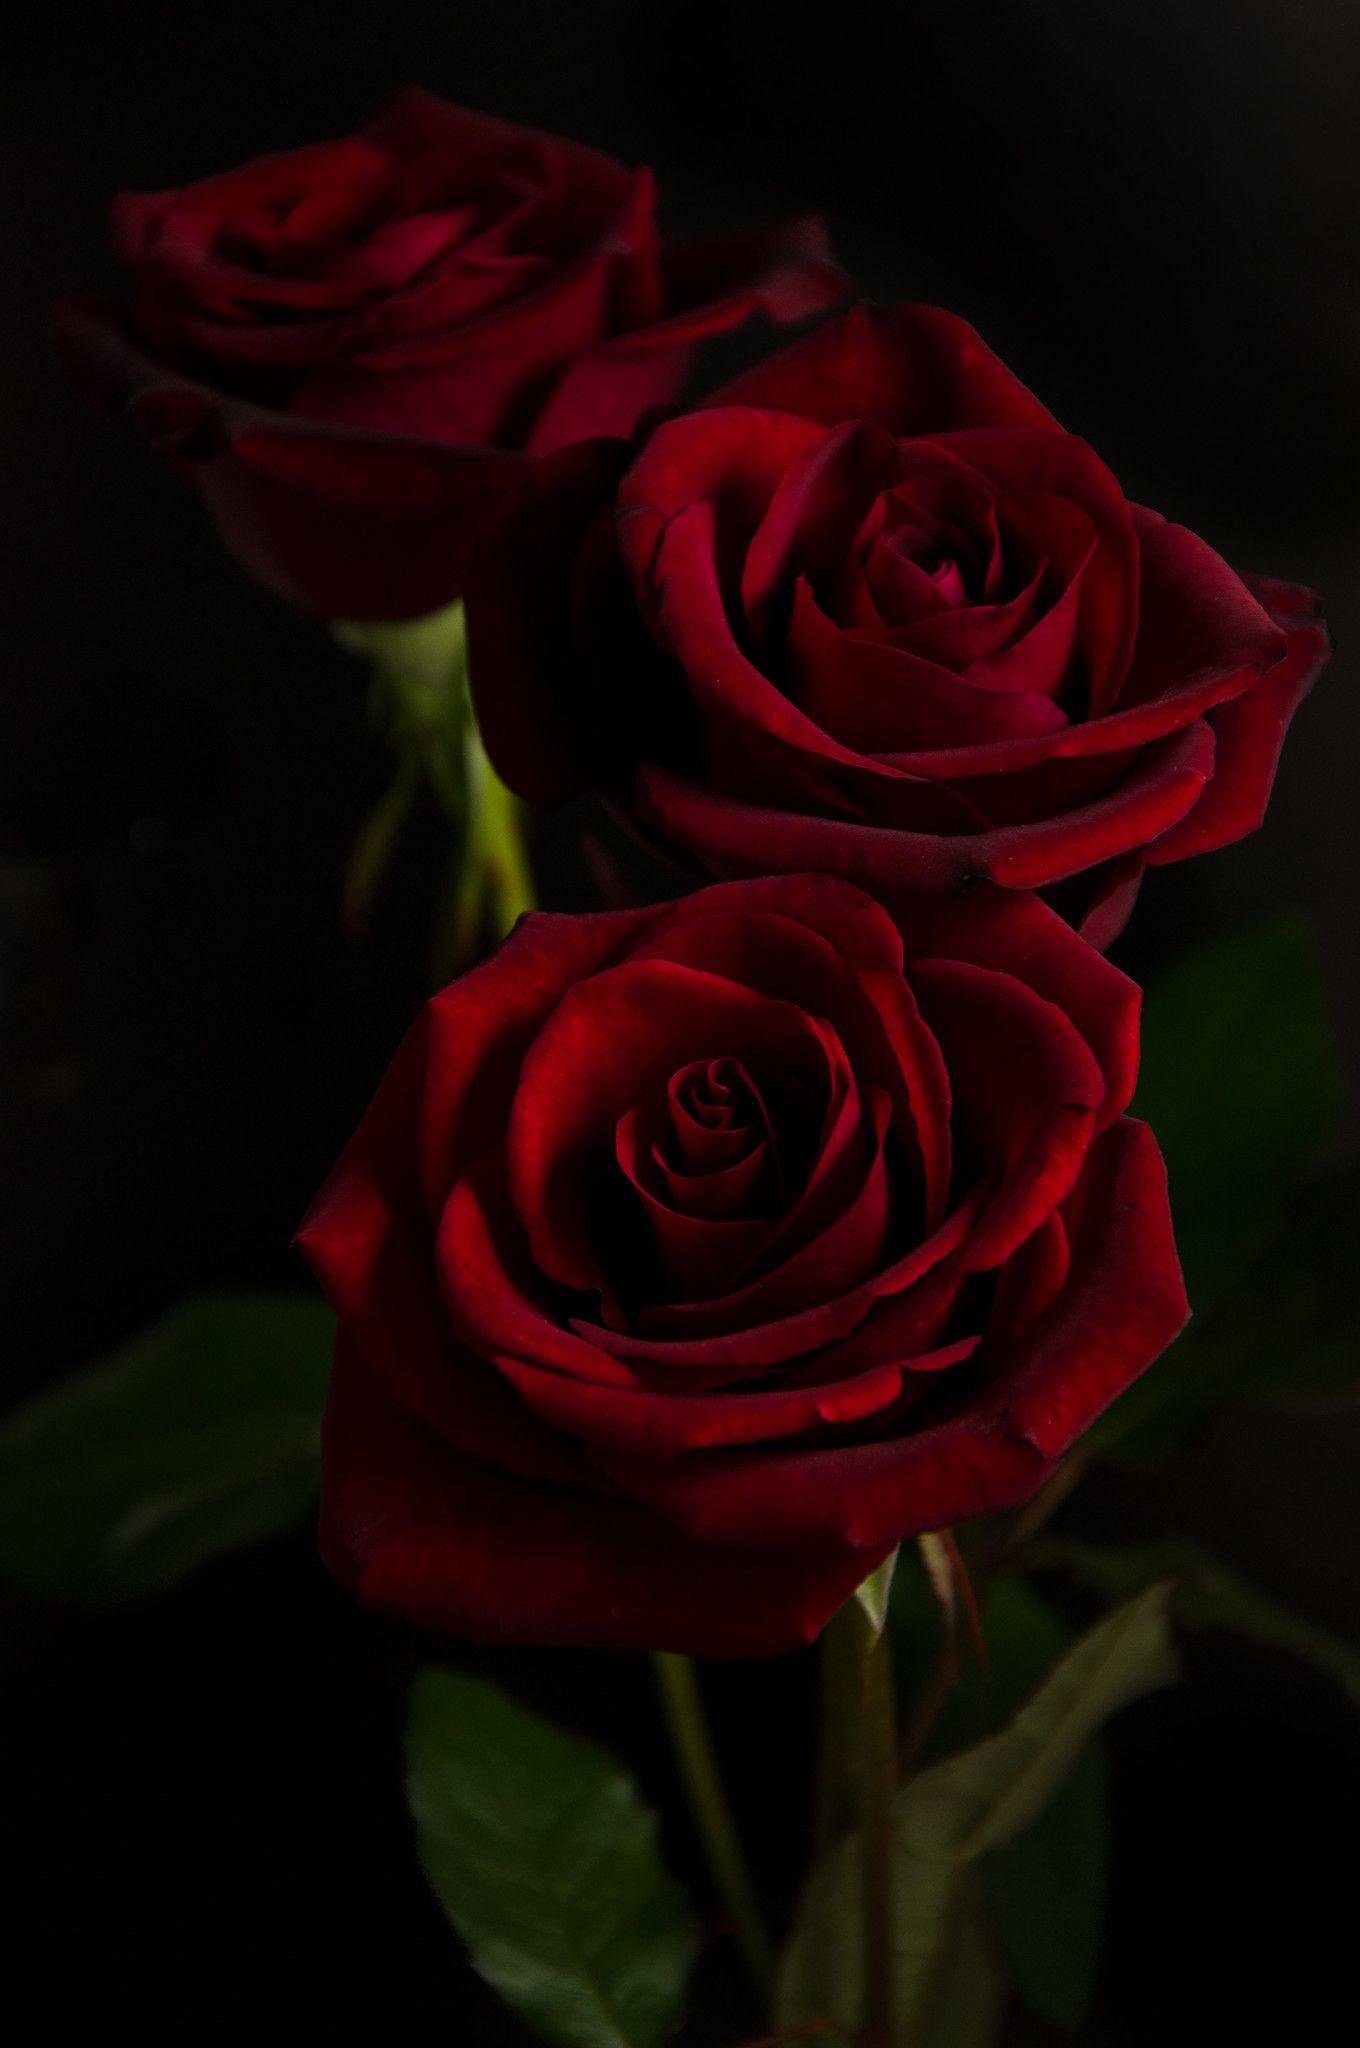 Red Rose On Black Hd Wallpaper Rose Wallpaper Flower Desktop Wallpaper Red Roses